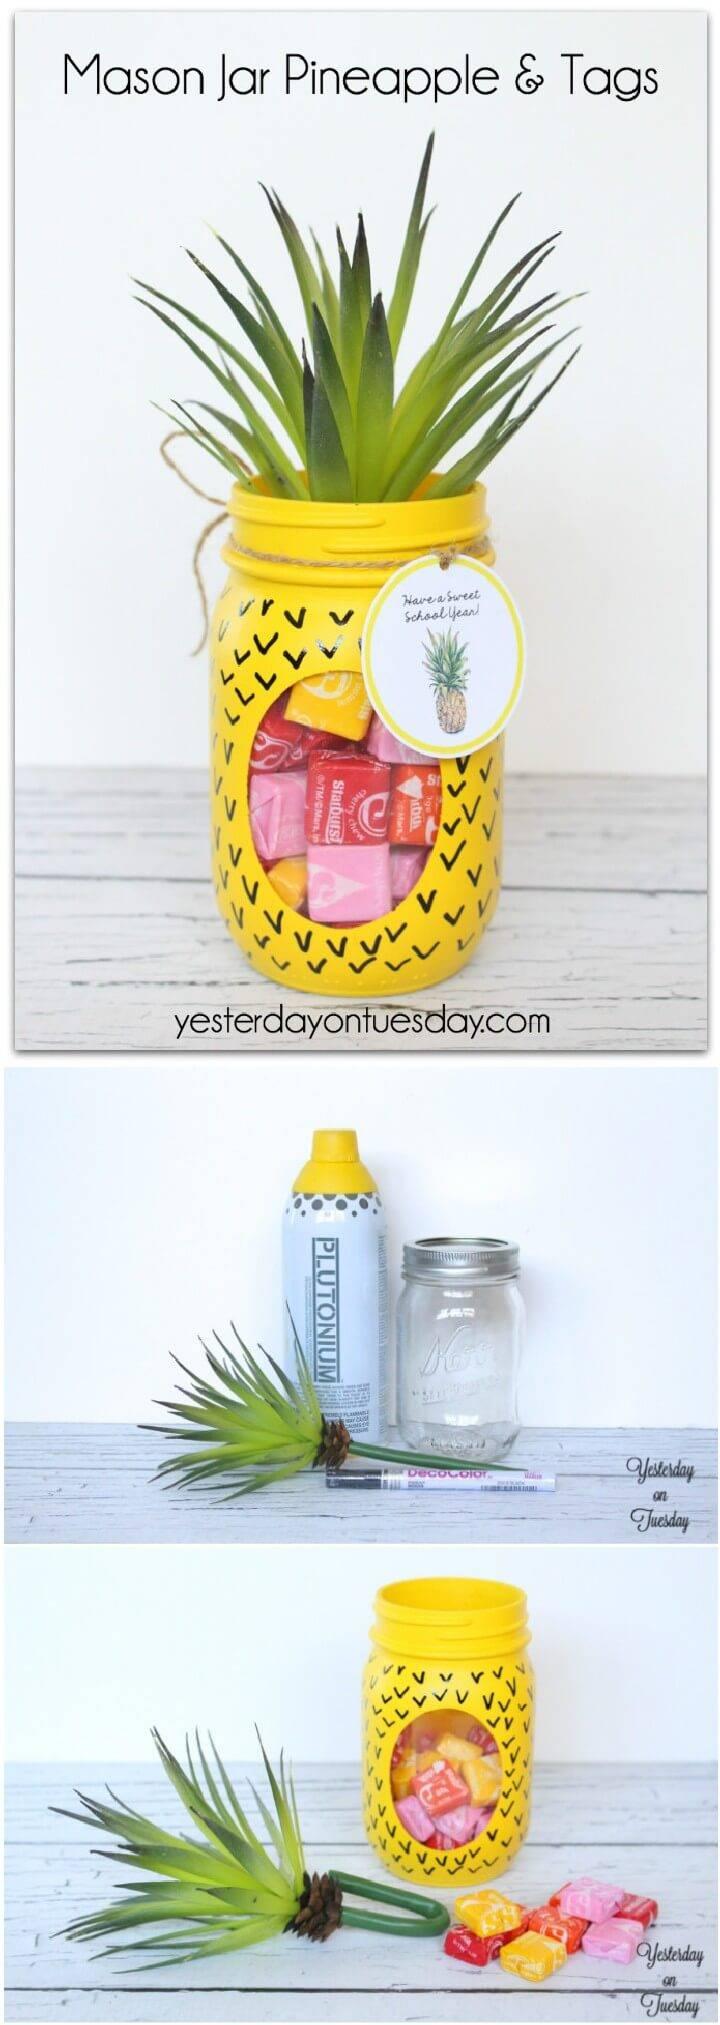 DIY Wonderful Mason Jar Pineapple Candy Gift